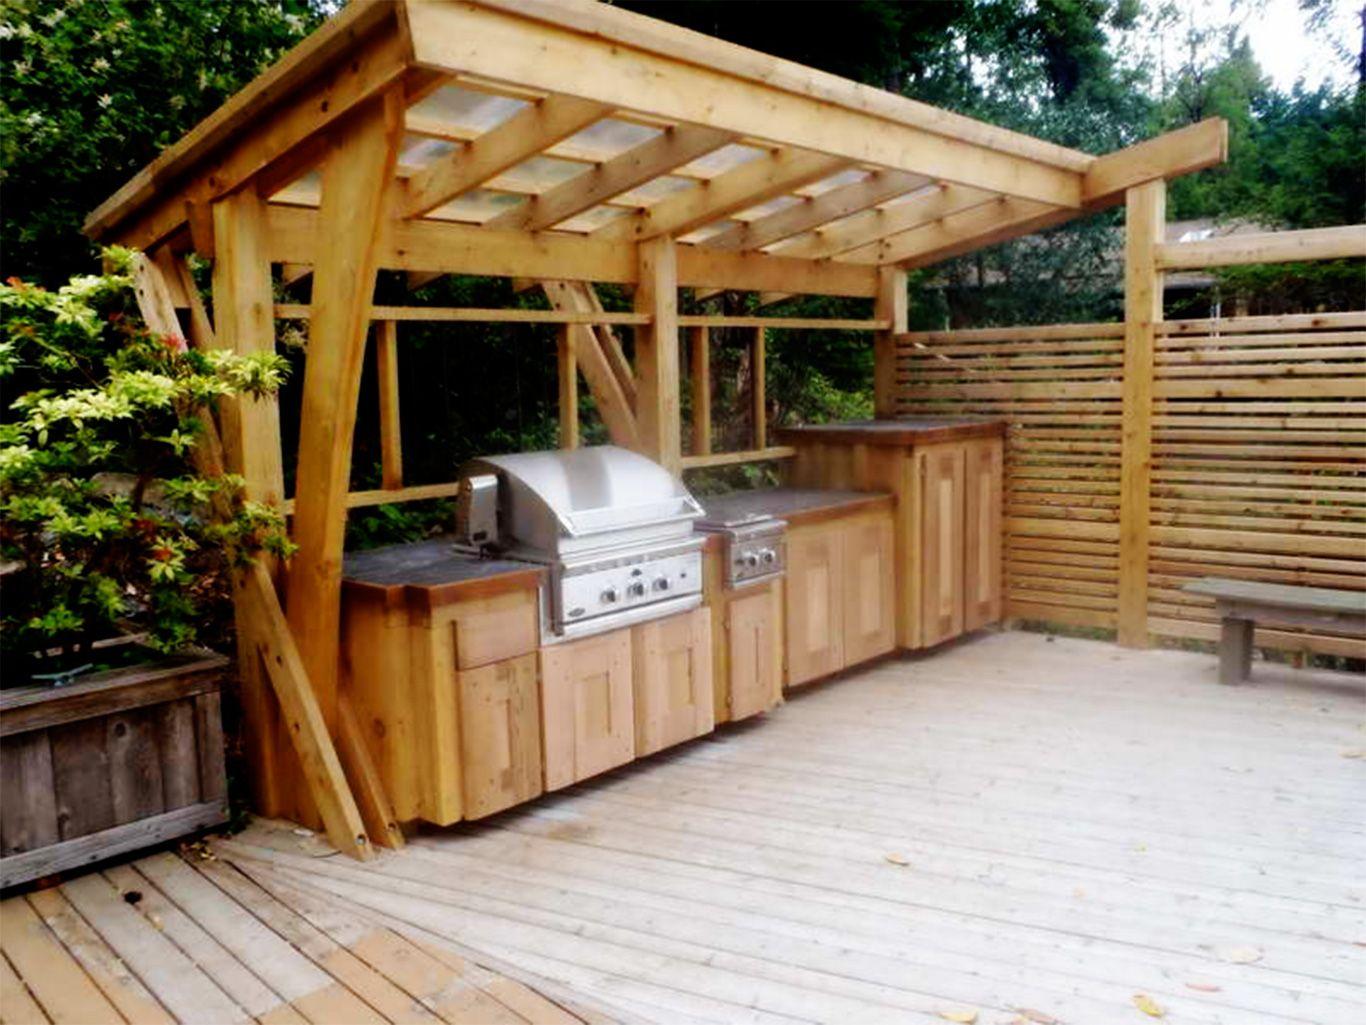 outdoor kitchen ideas outdoor kitchen ideas Outdoor Kitchen Designs with Roofs Kitchen Roof Design Gazebo Designs Innovative Outdoor Kitchen Roof